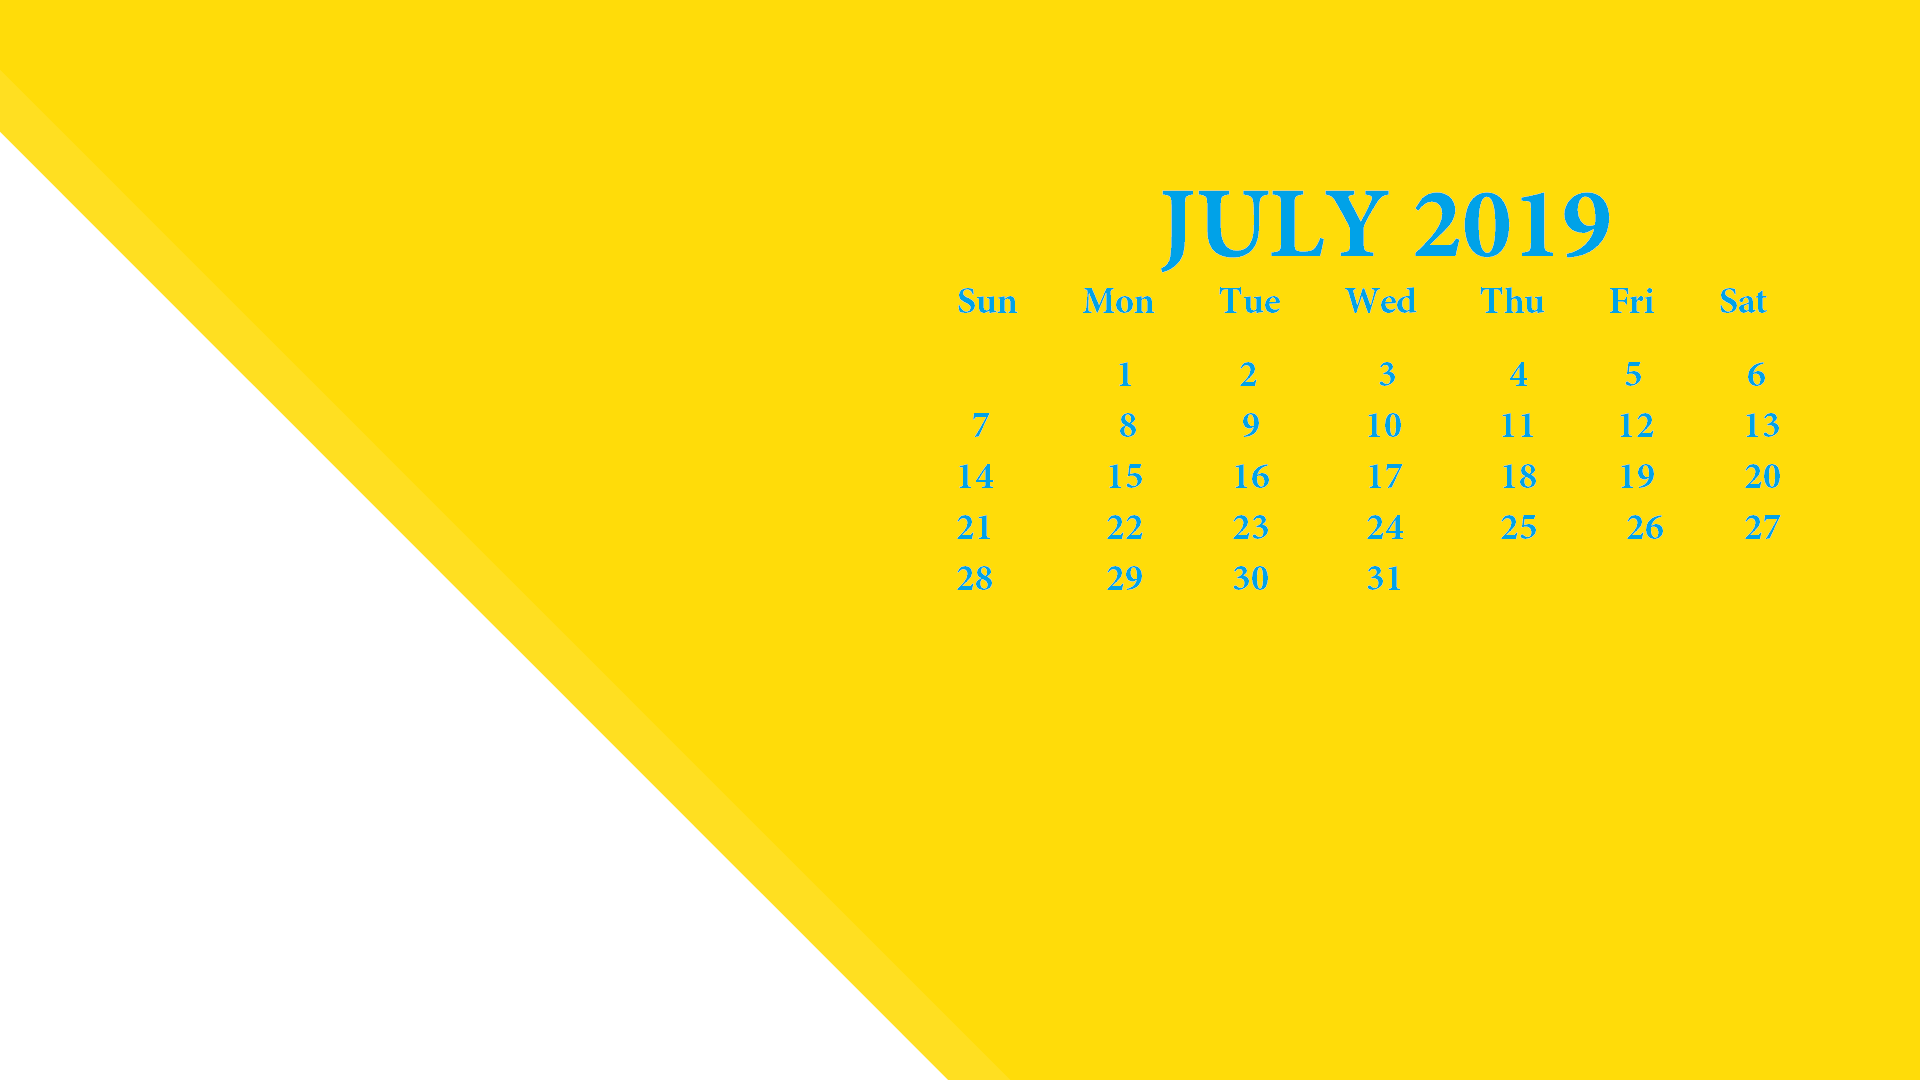 July 2019 Screensaver Background Calendar